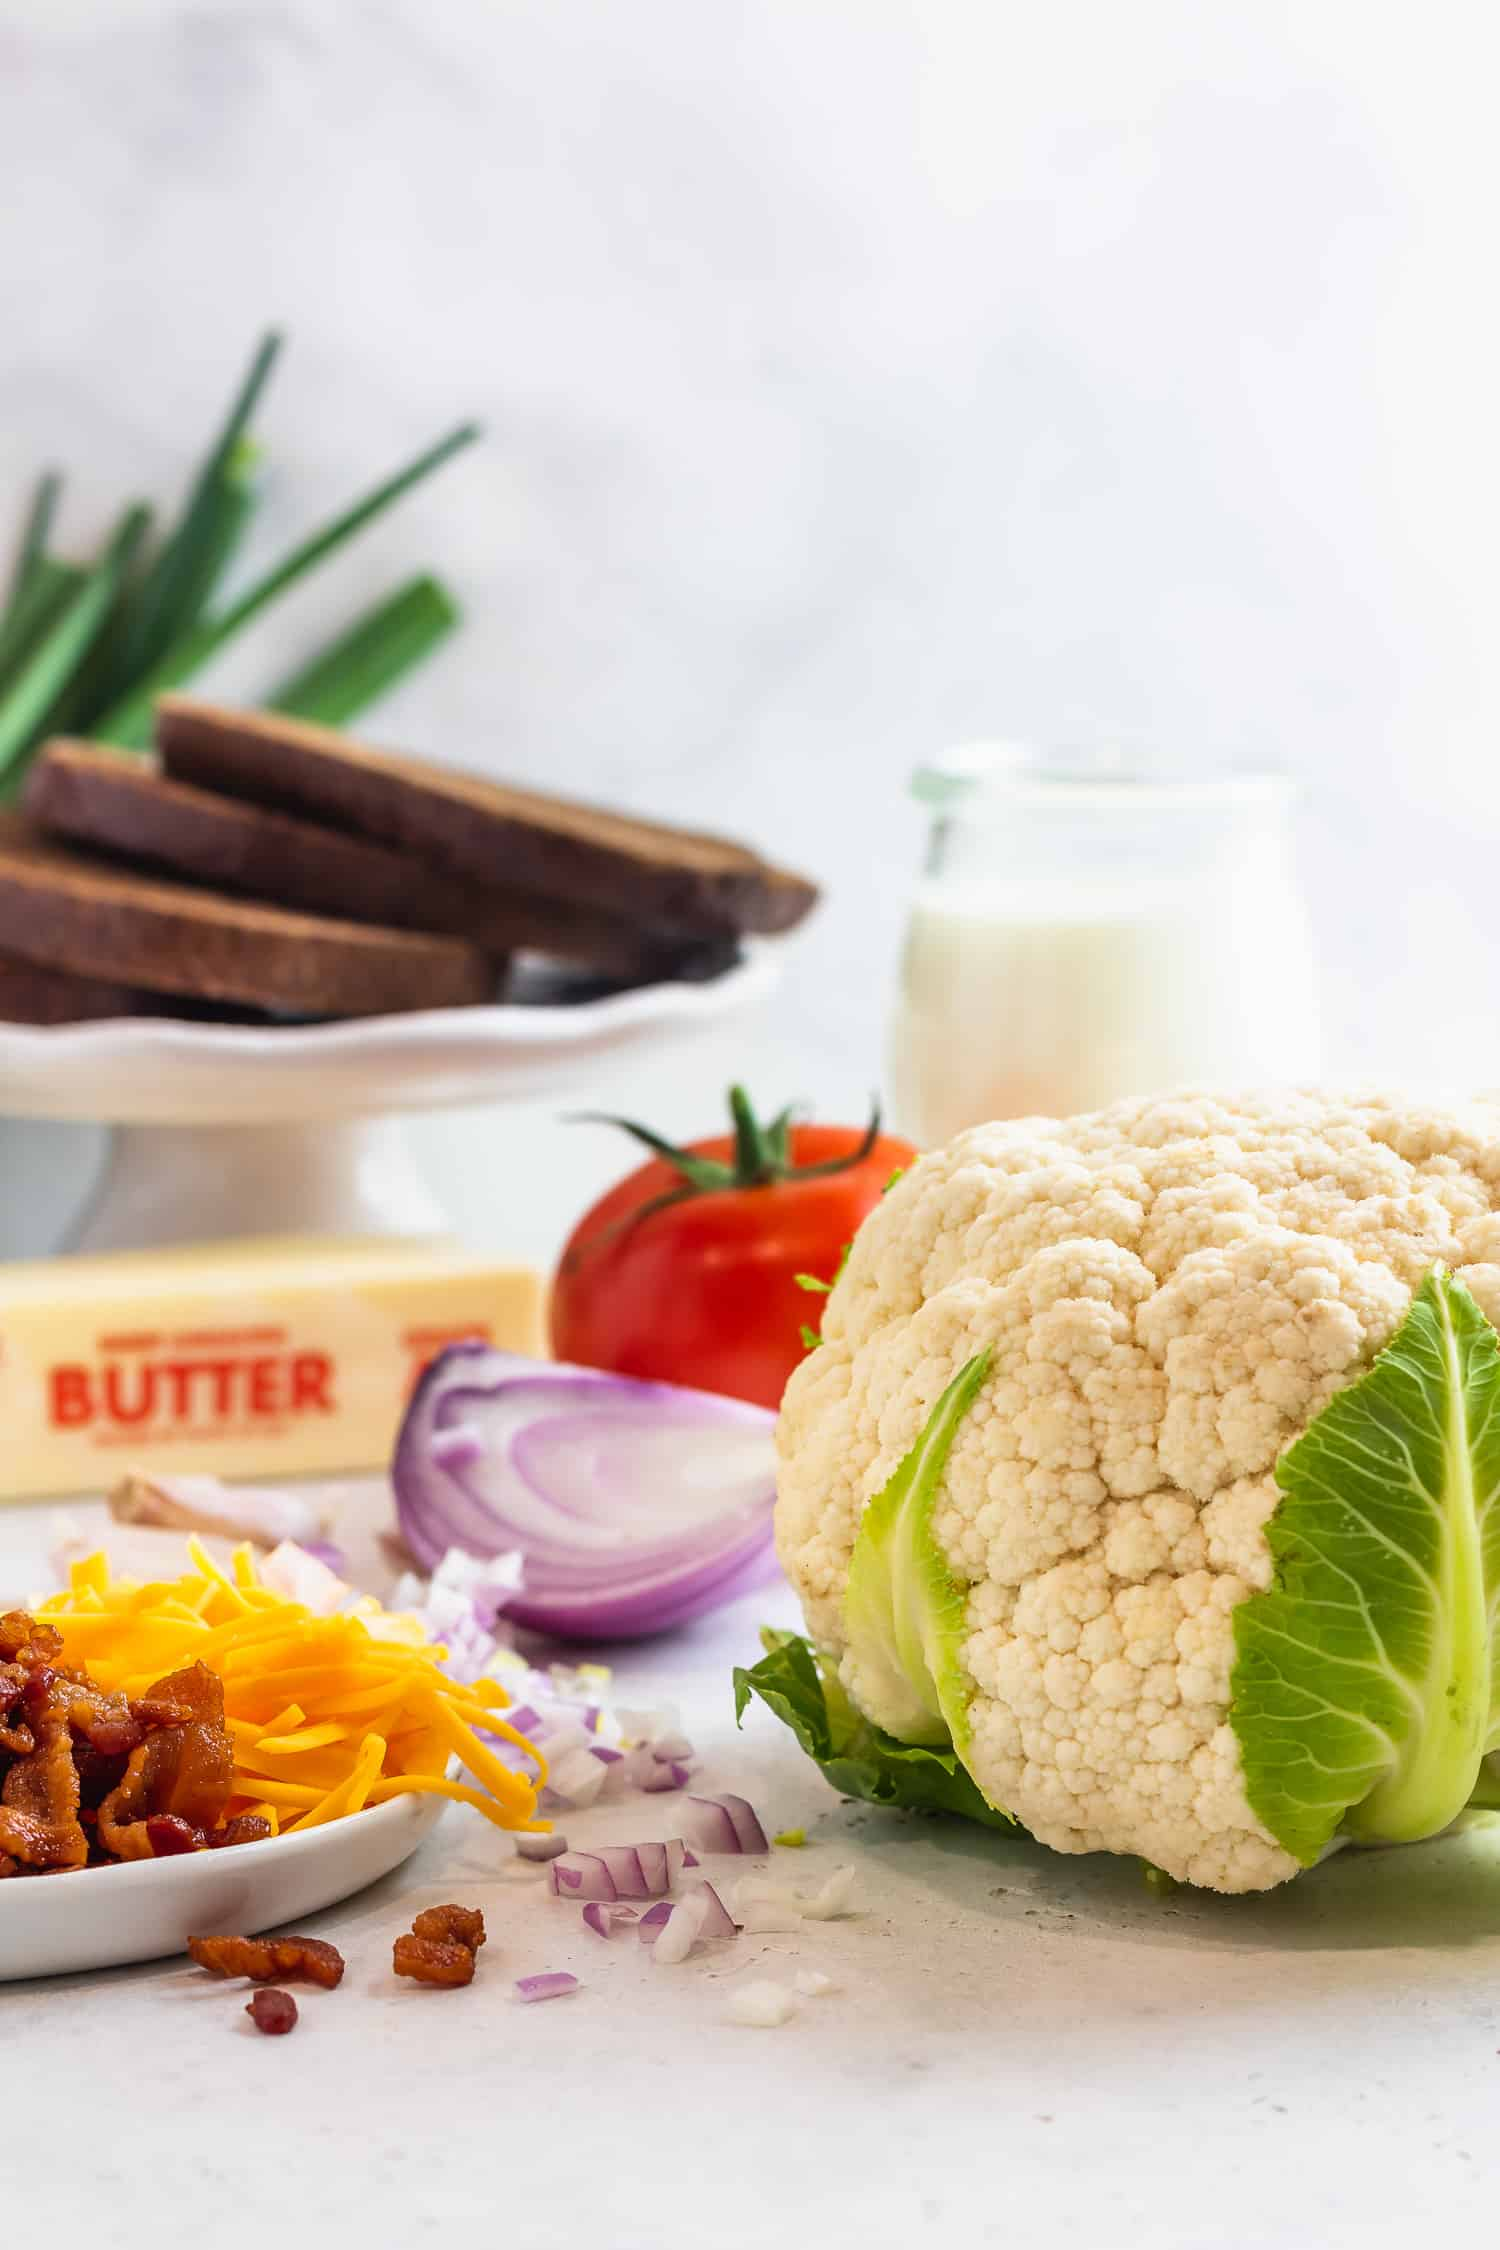 cauliflower, red onion, tomato, butter, cream, cheese, bacon, and pumpernickel bread